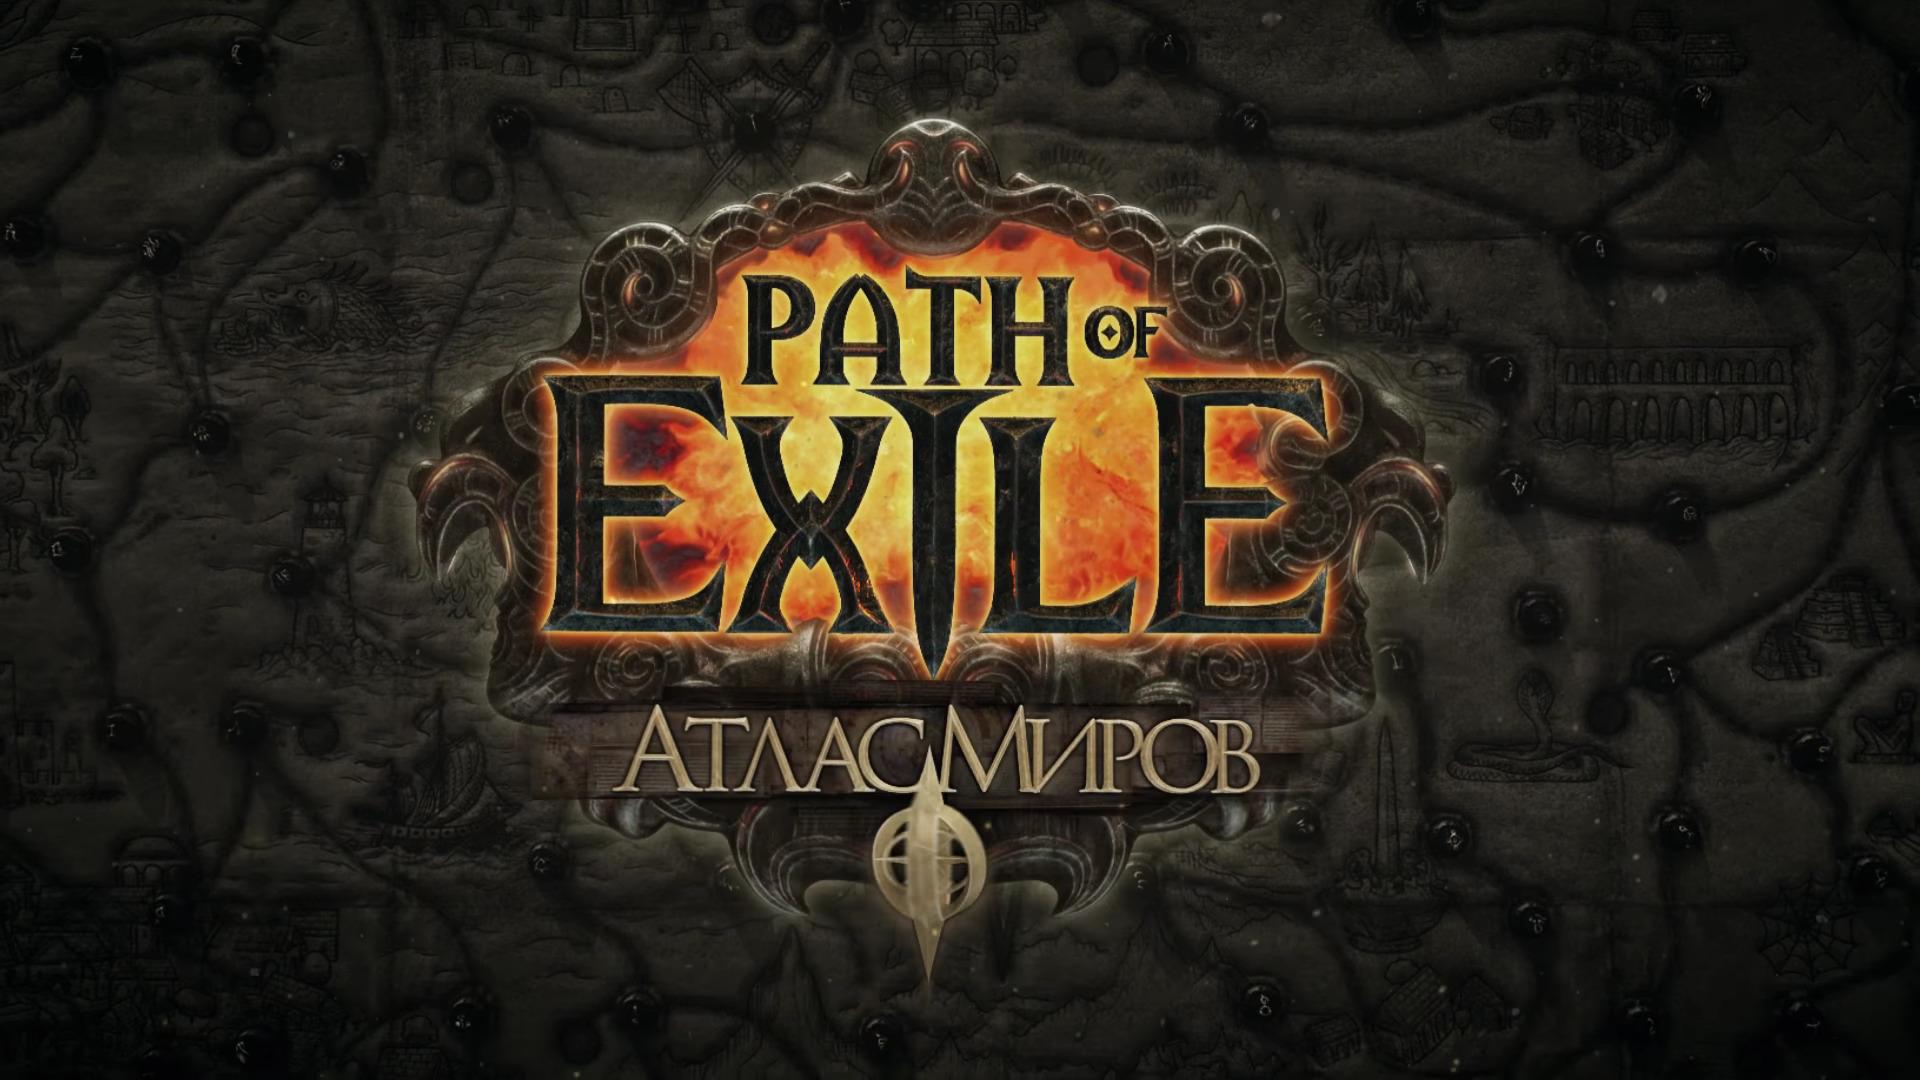 Трейлер дополнения Breach для Path of Exile